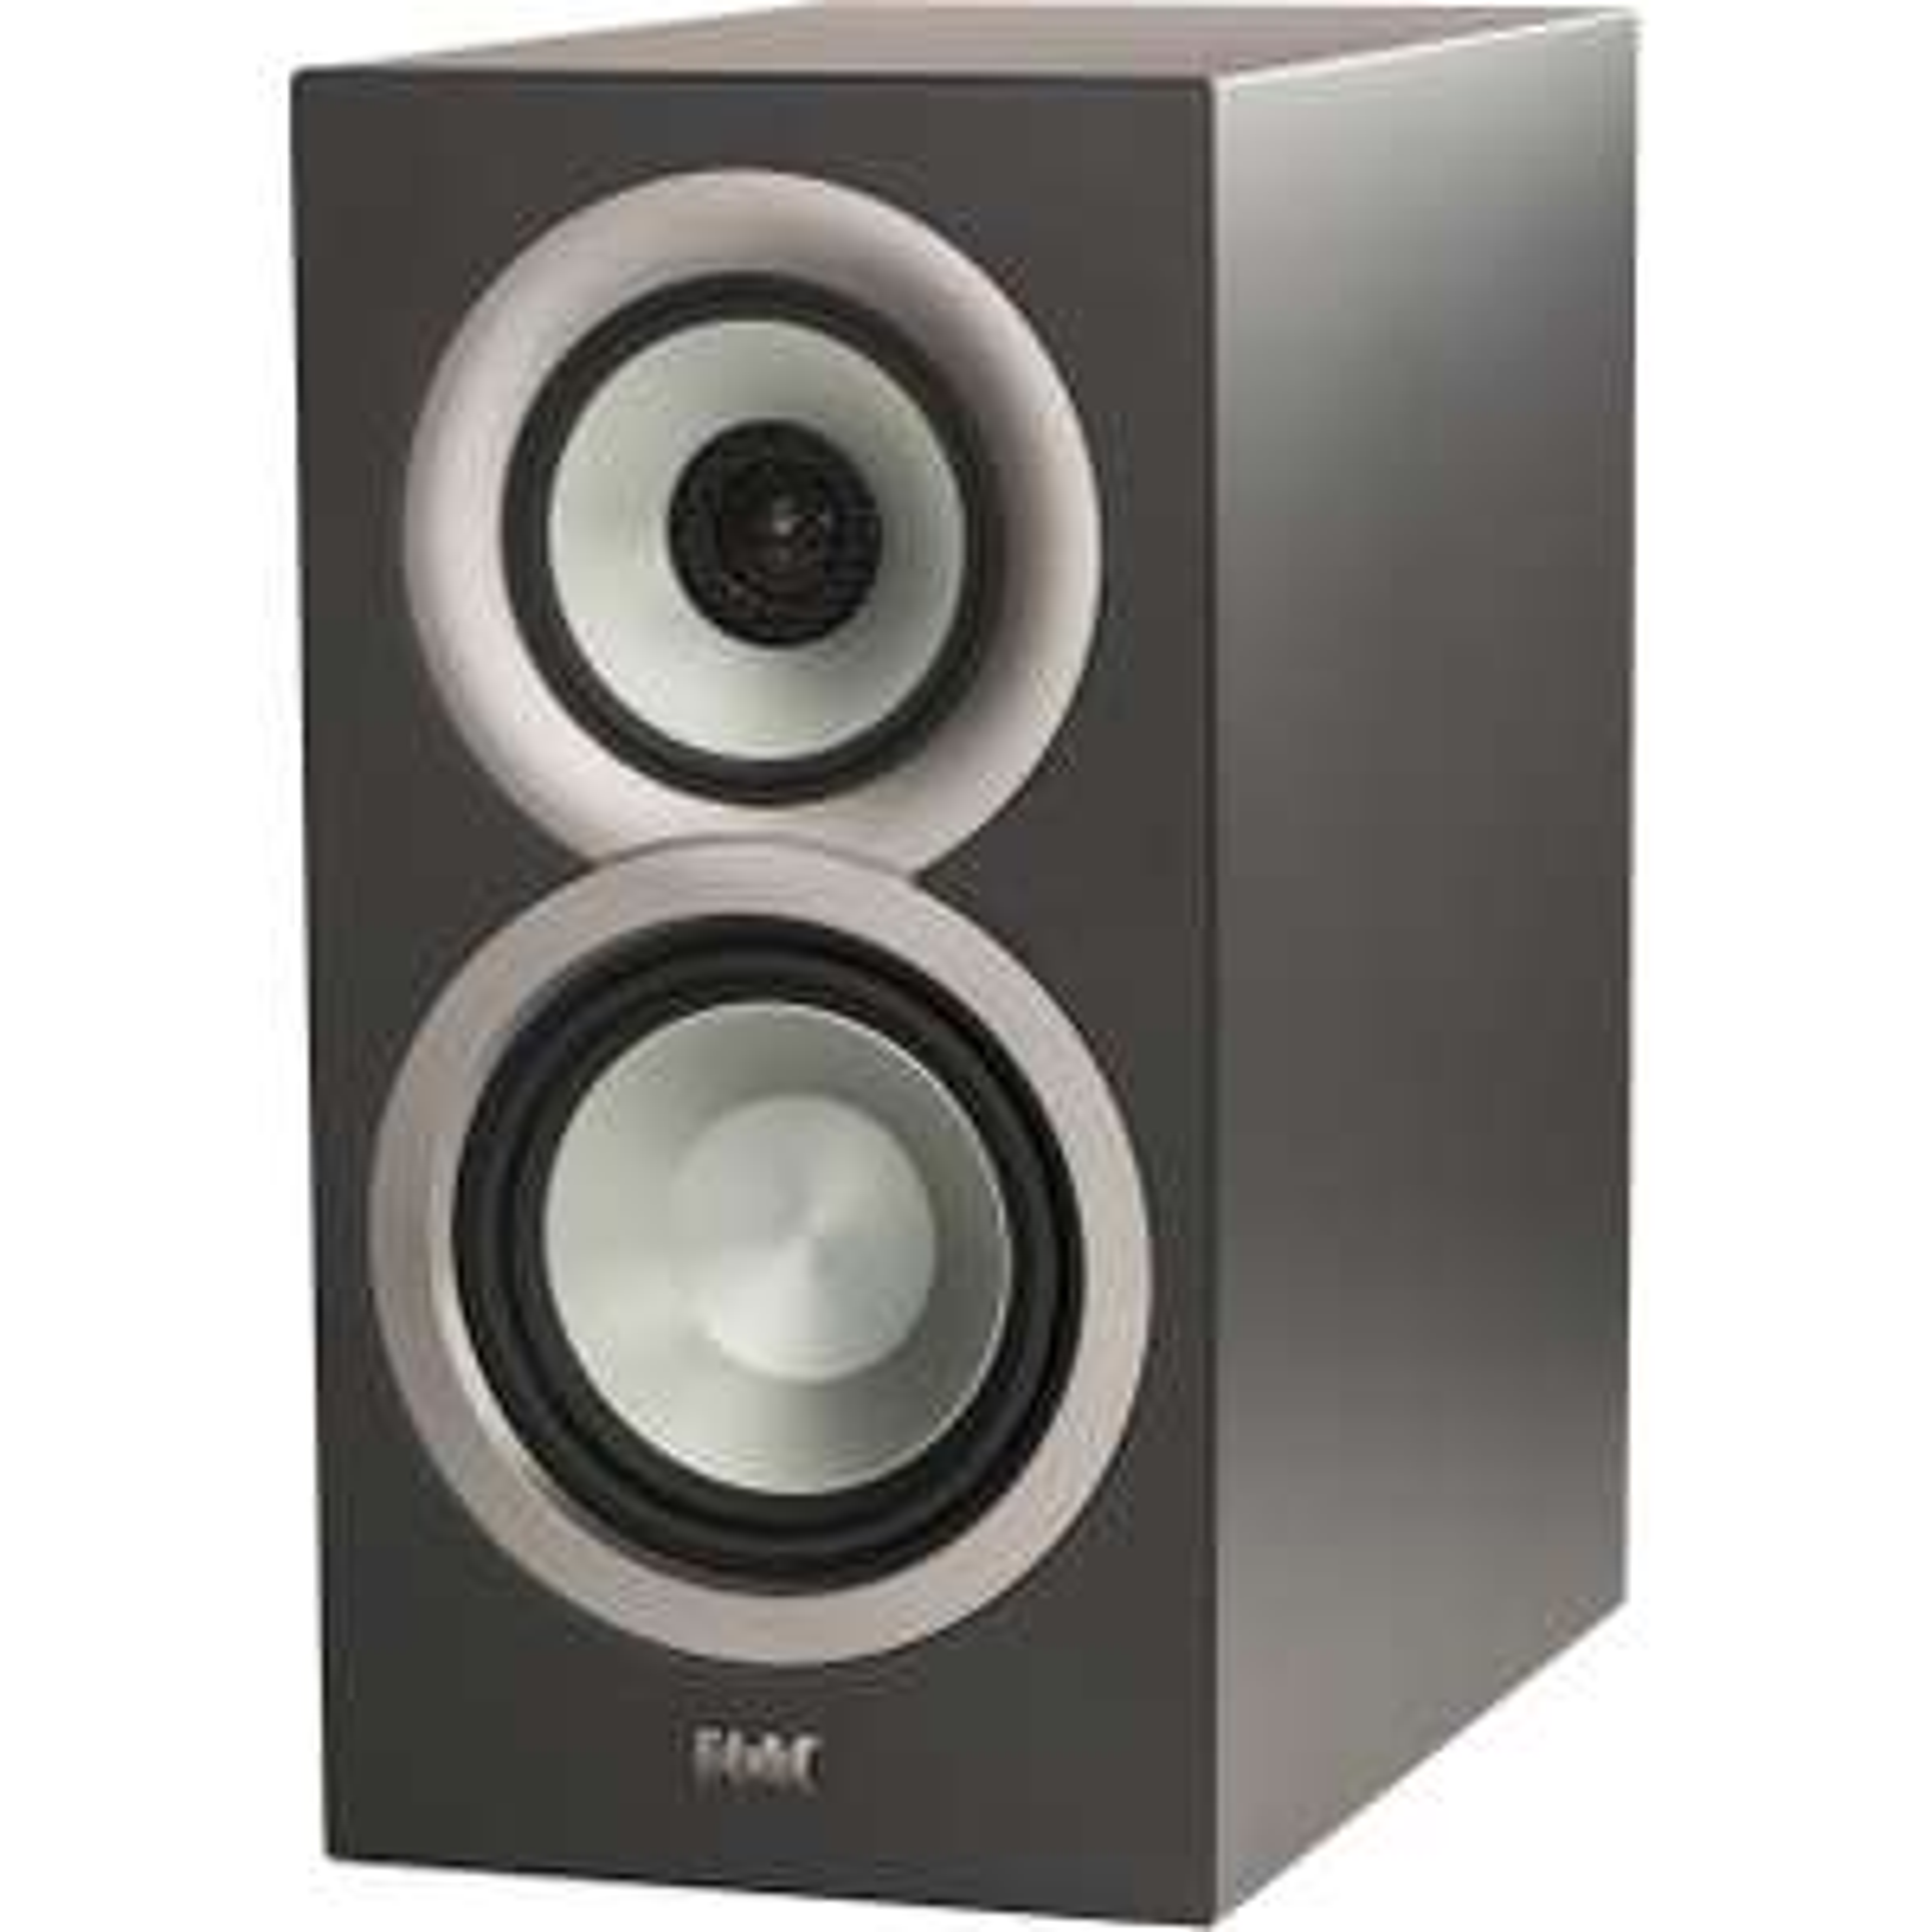 Elac Uni-Fi BS U5 Lautsprecher (Stückpreis, 3-Wege, 2,5cm Hochtöner, 10cm Mitteltöner, 13cm Tieftöner, 46Hz - 25kHz, 85dB, 4Ω)